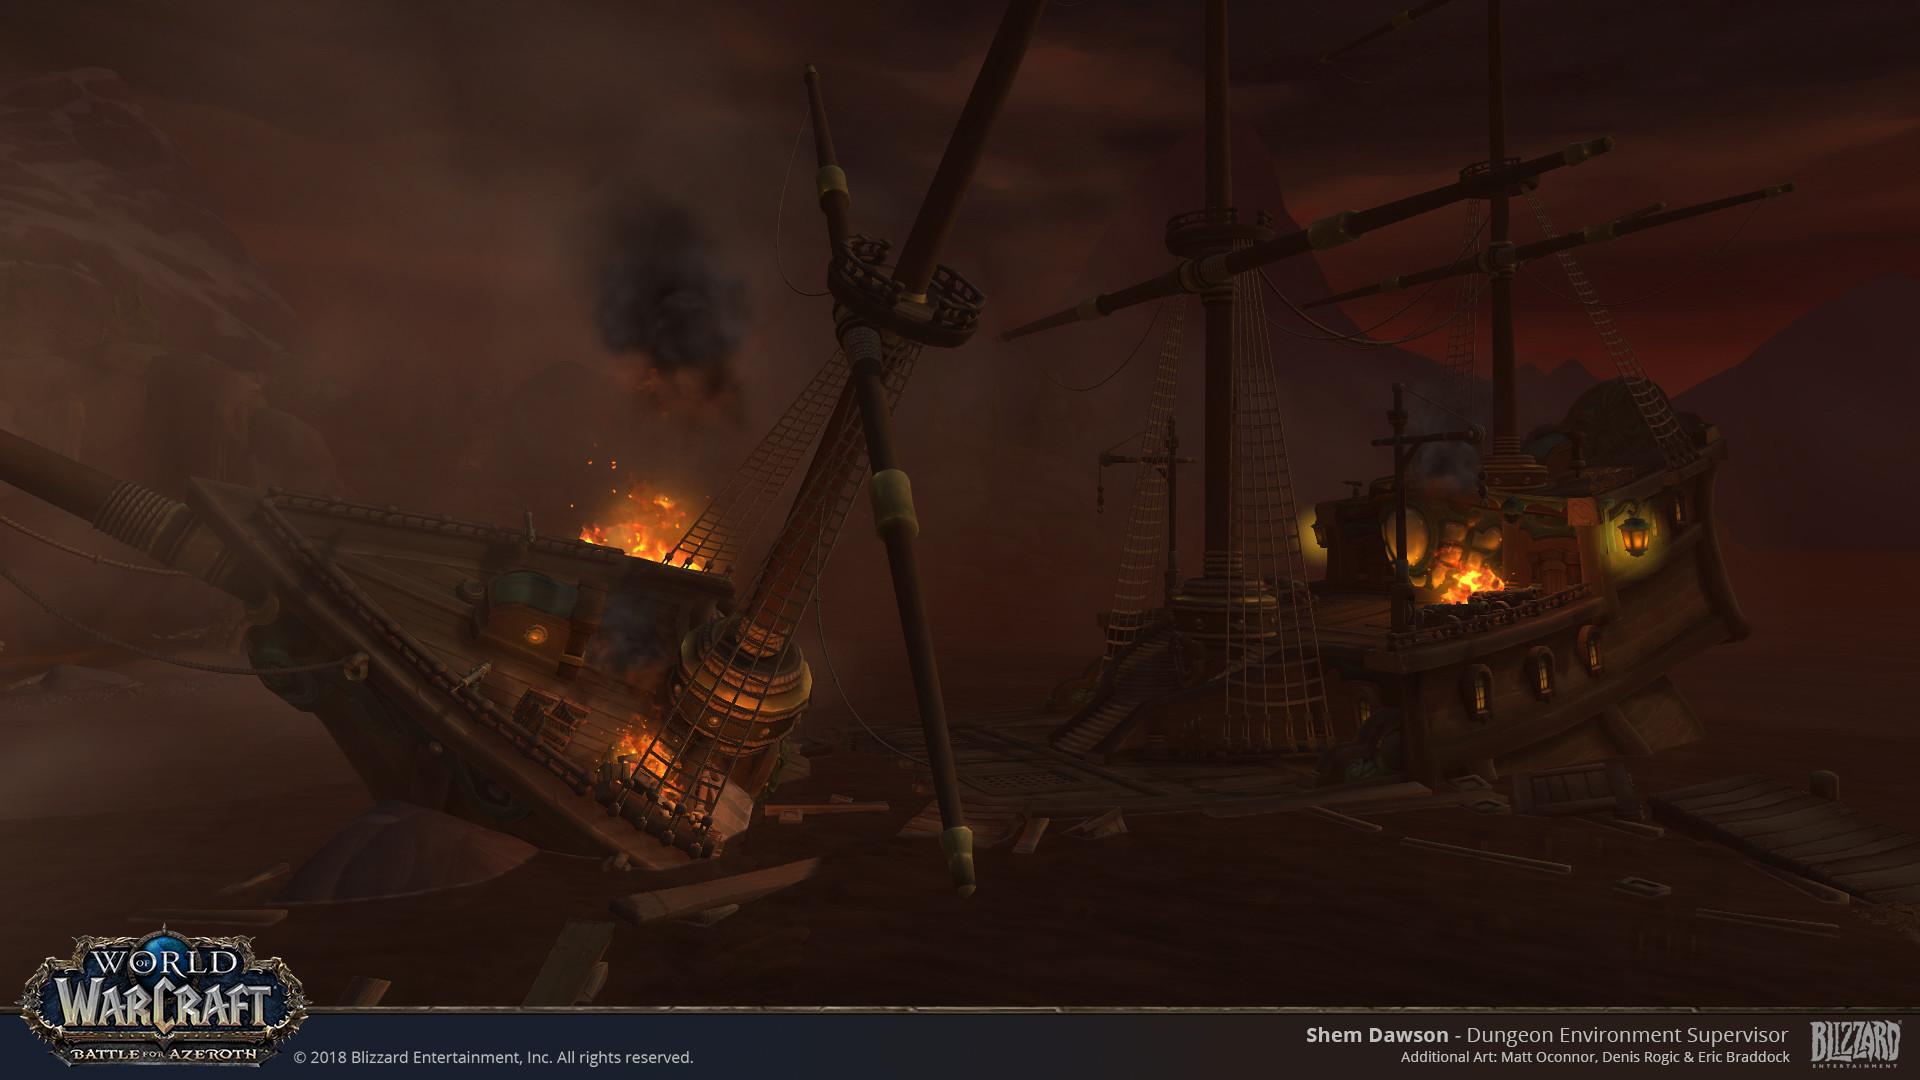 Shem dawson shem dawson shipwreck01